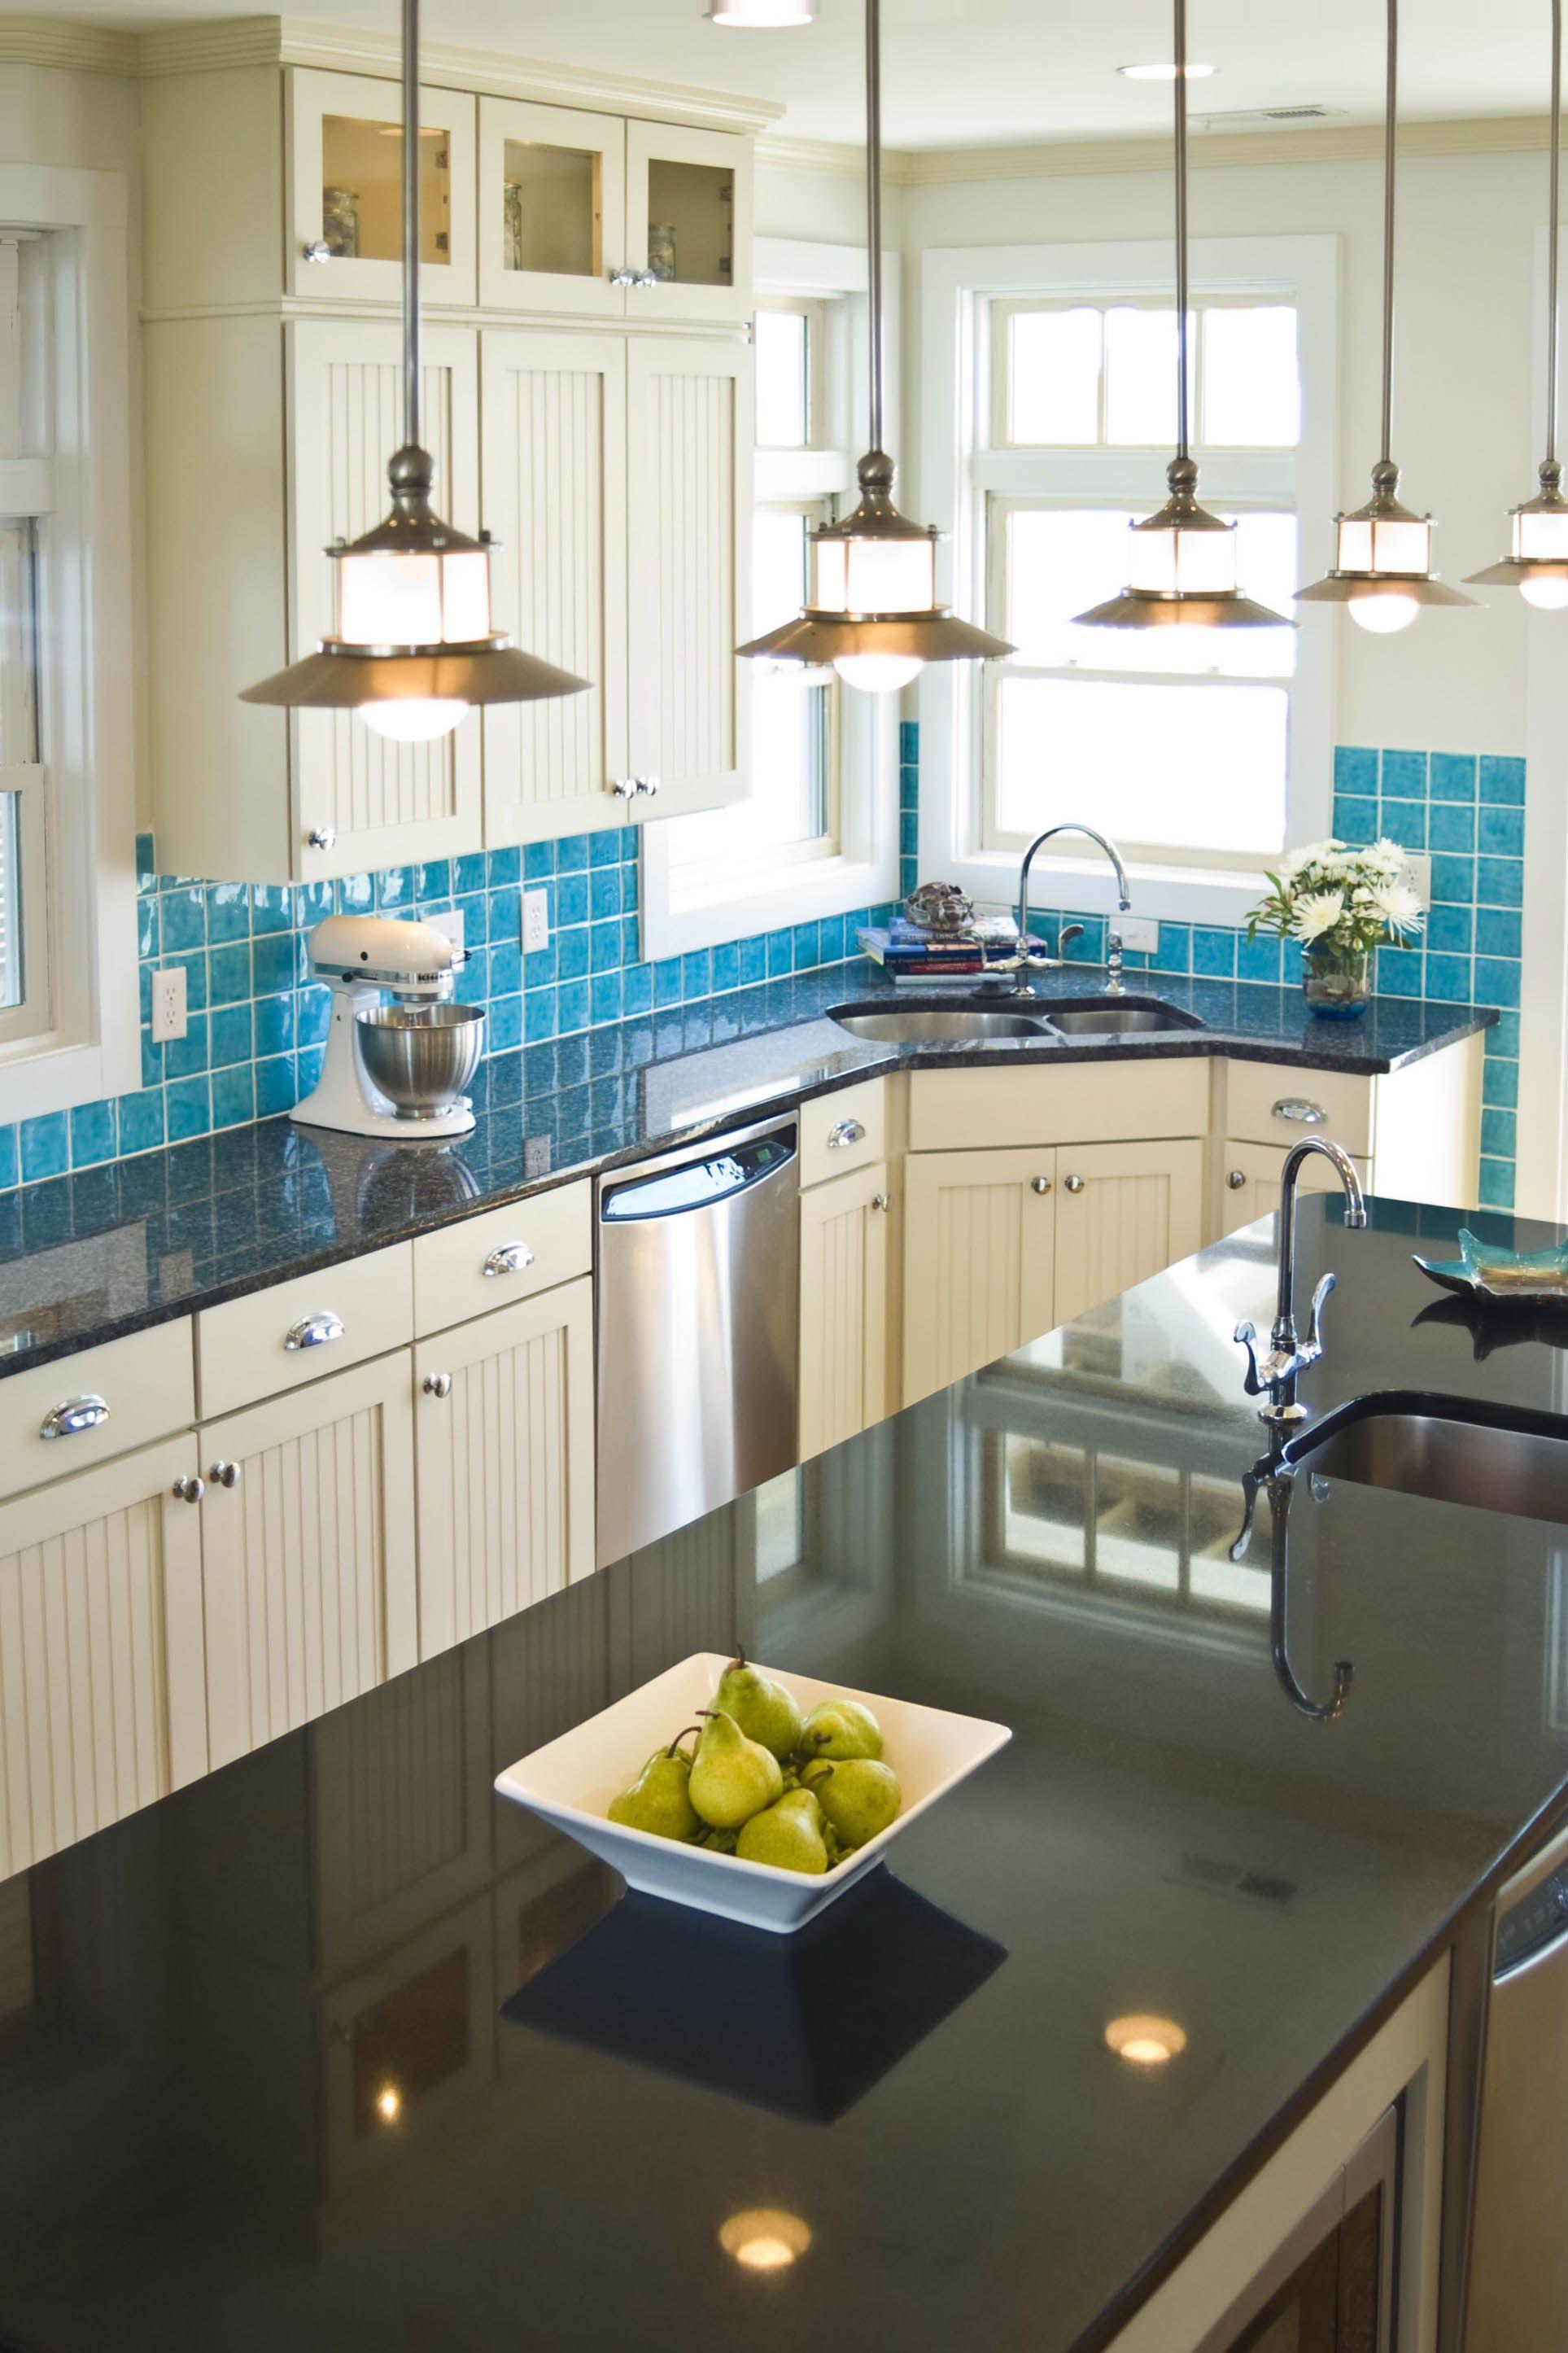 Best Kitchen Gallery: Love The Blue Splash Tiles Warner Beach House Kitchen Beach of Beach House Number Tiles on rachelxblog.com